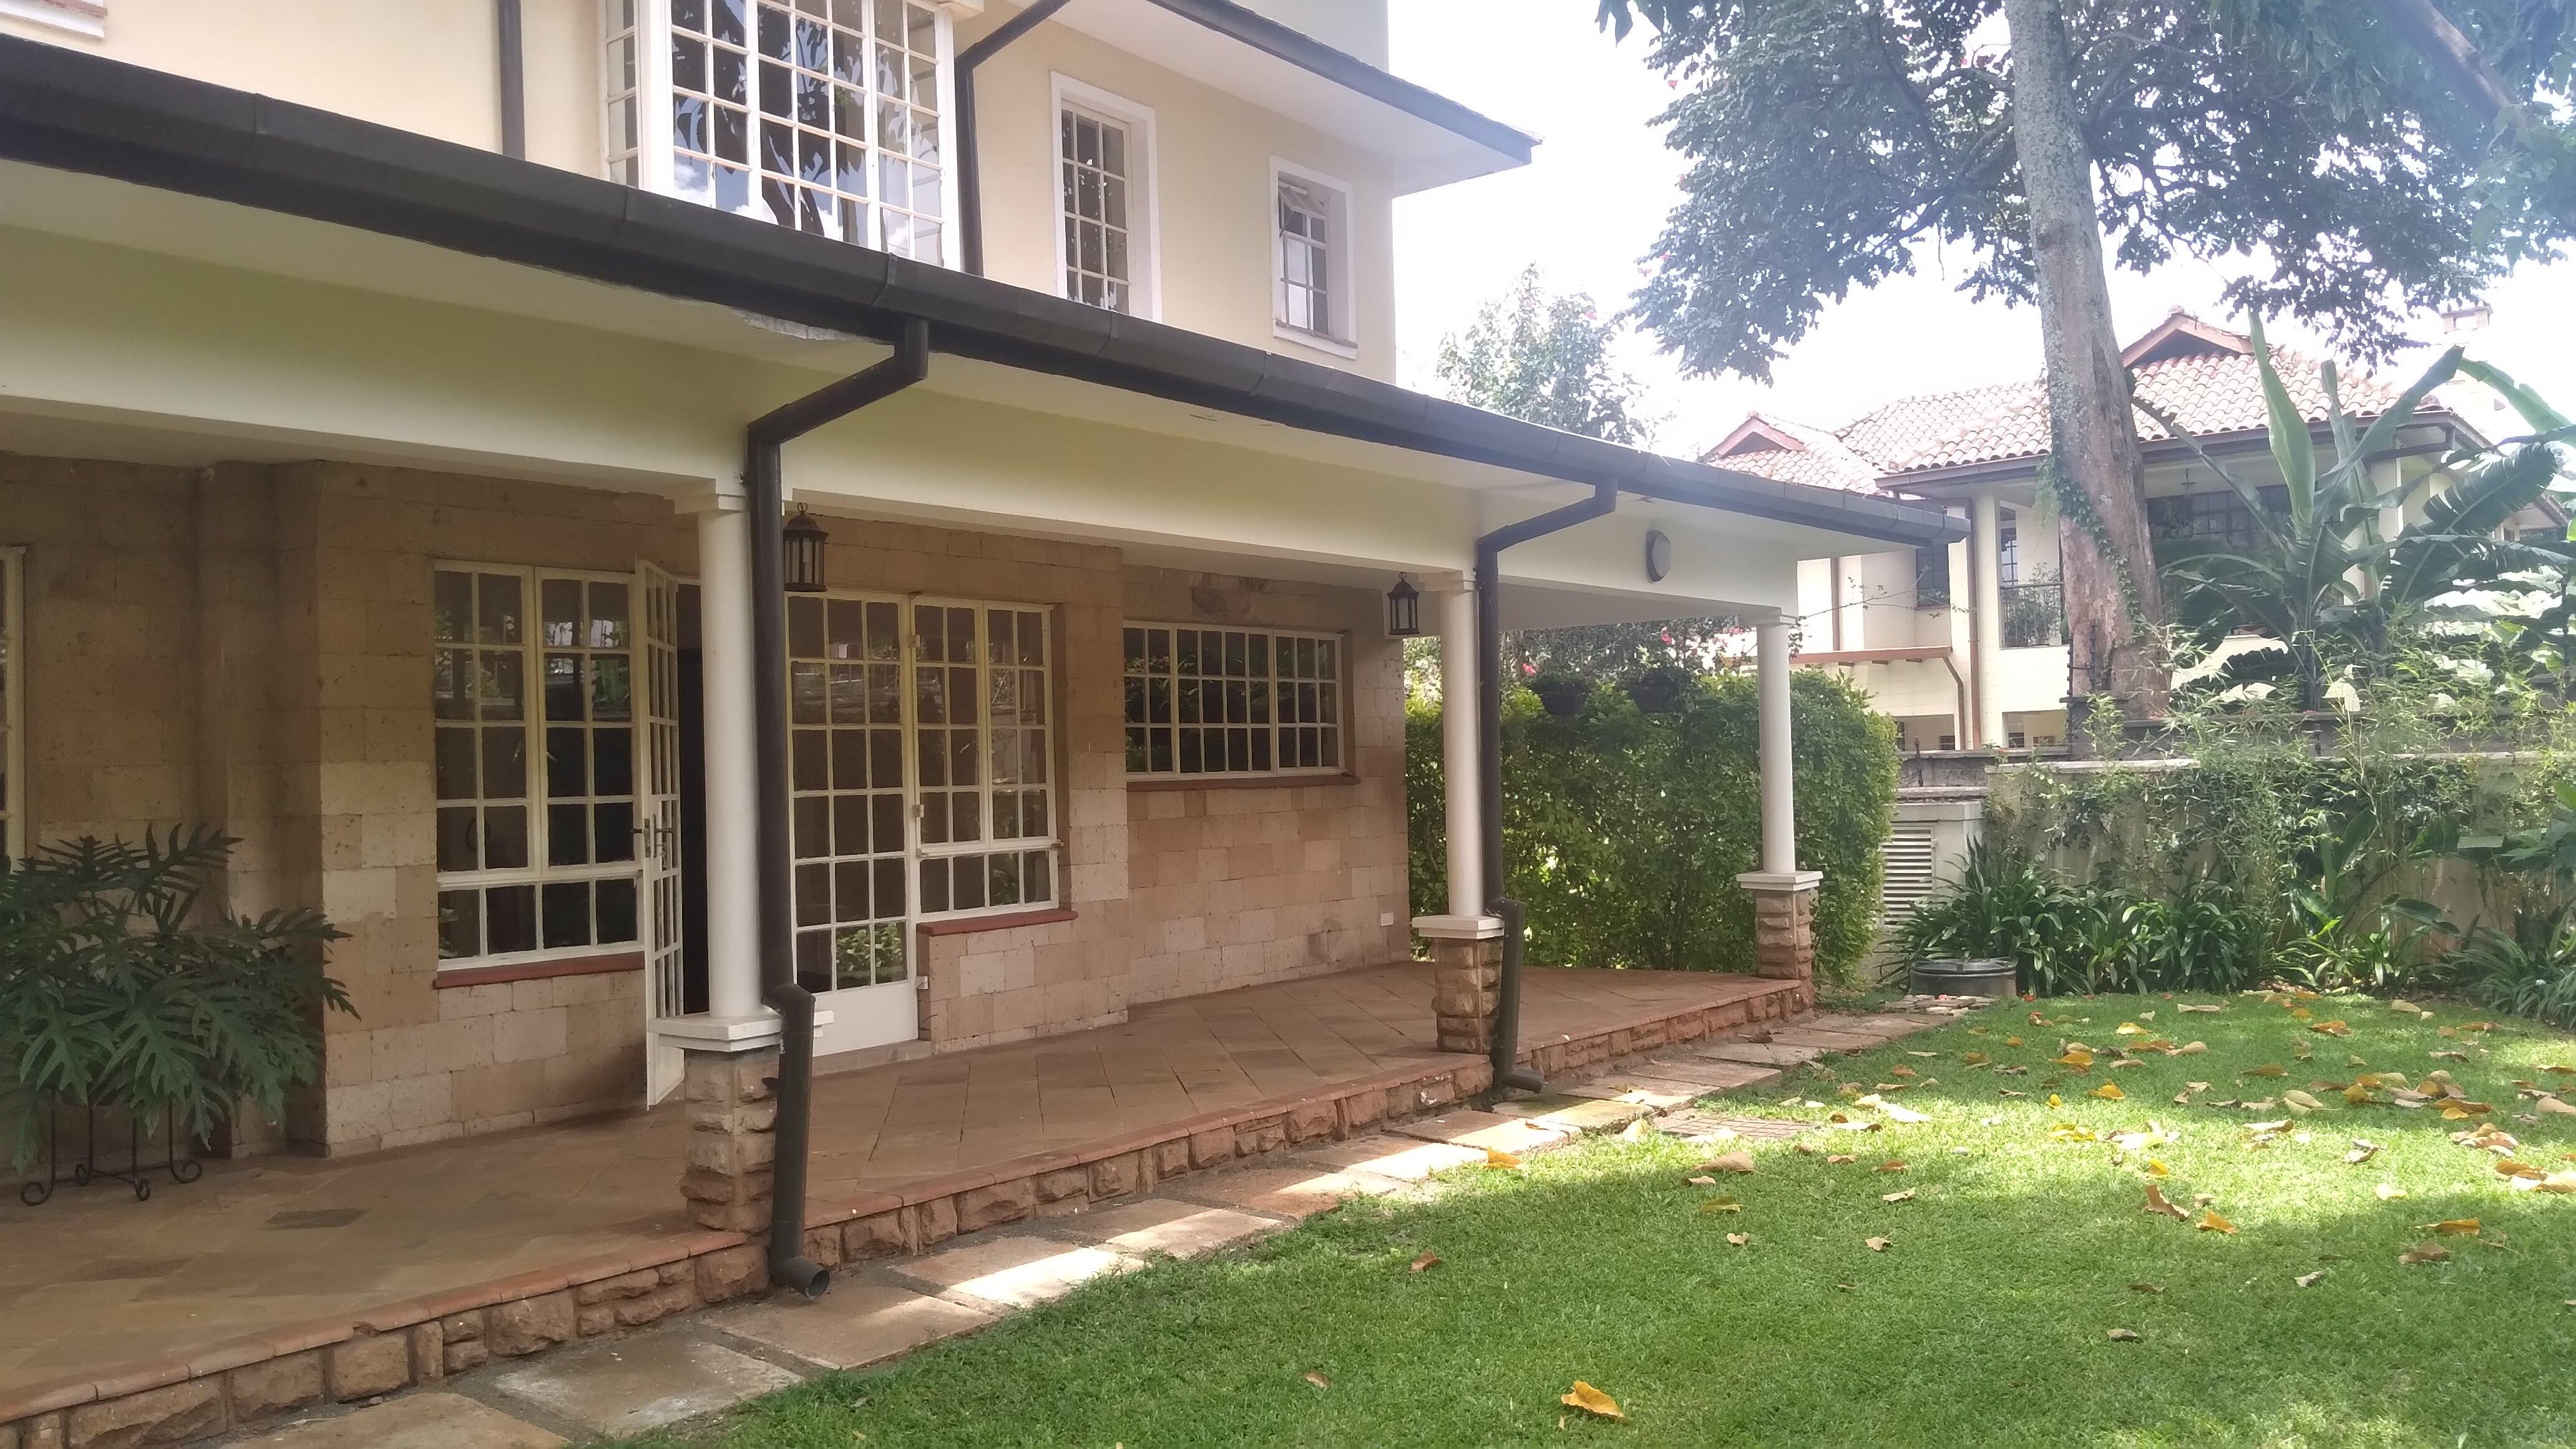 5 Bedroom plus Dsq Townhouse in Lavington